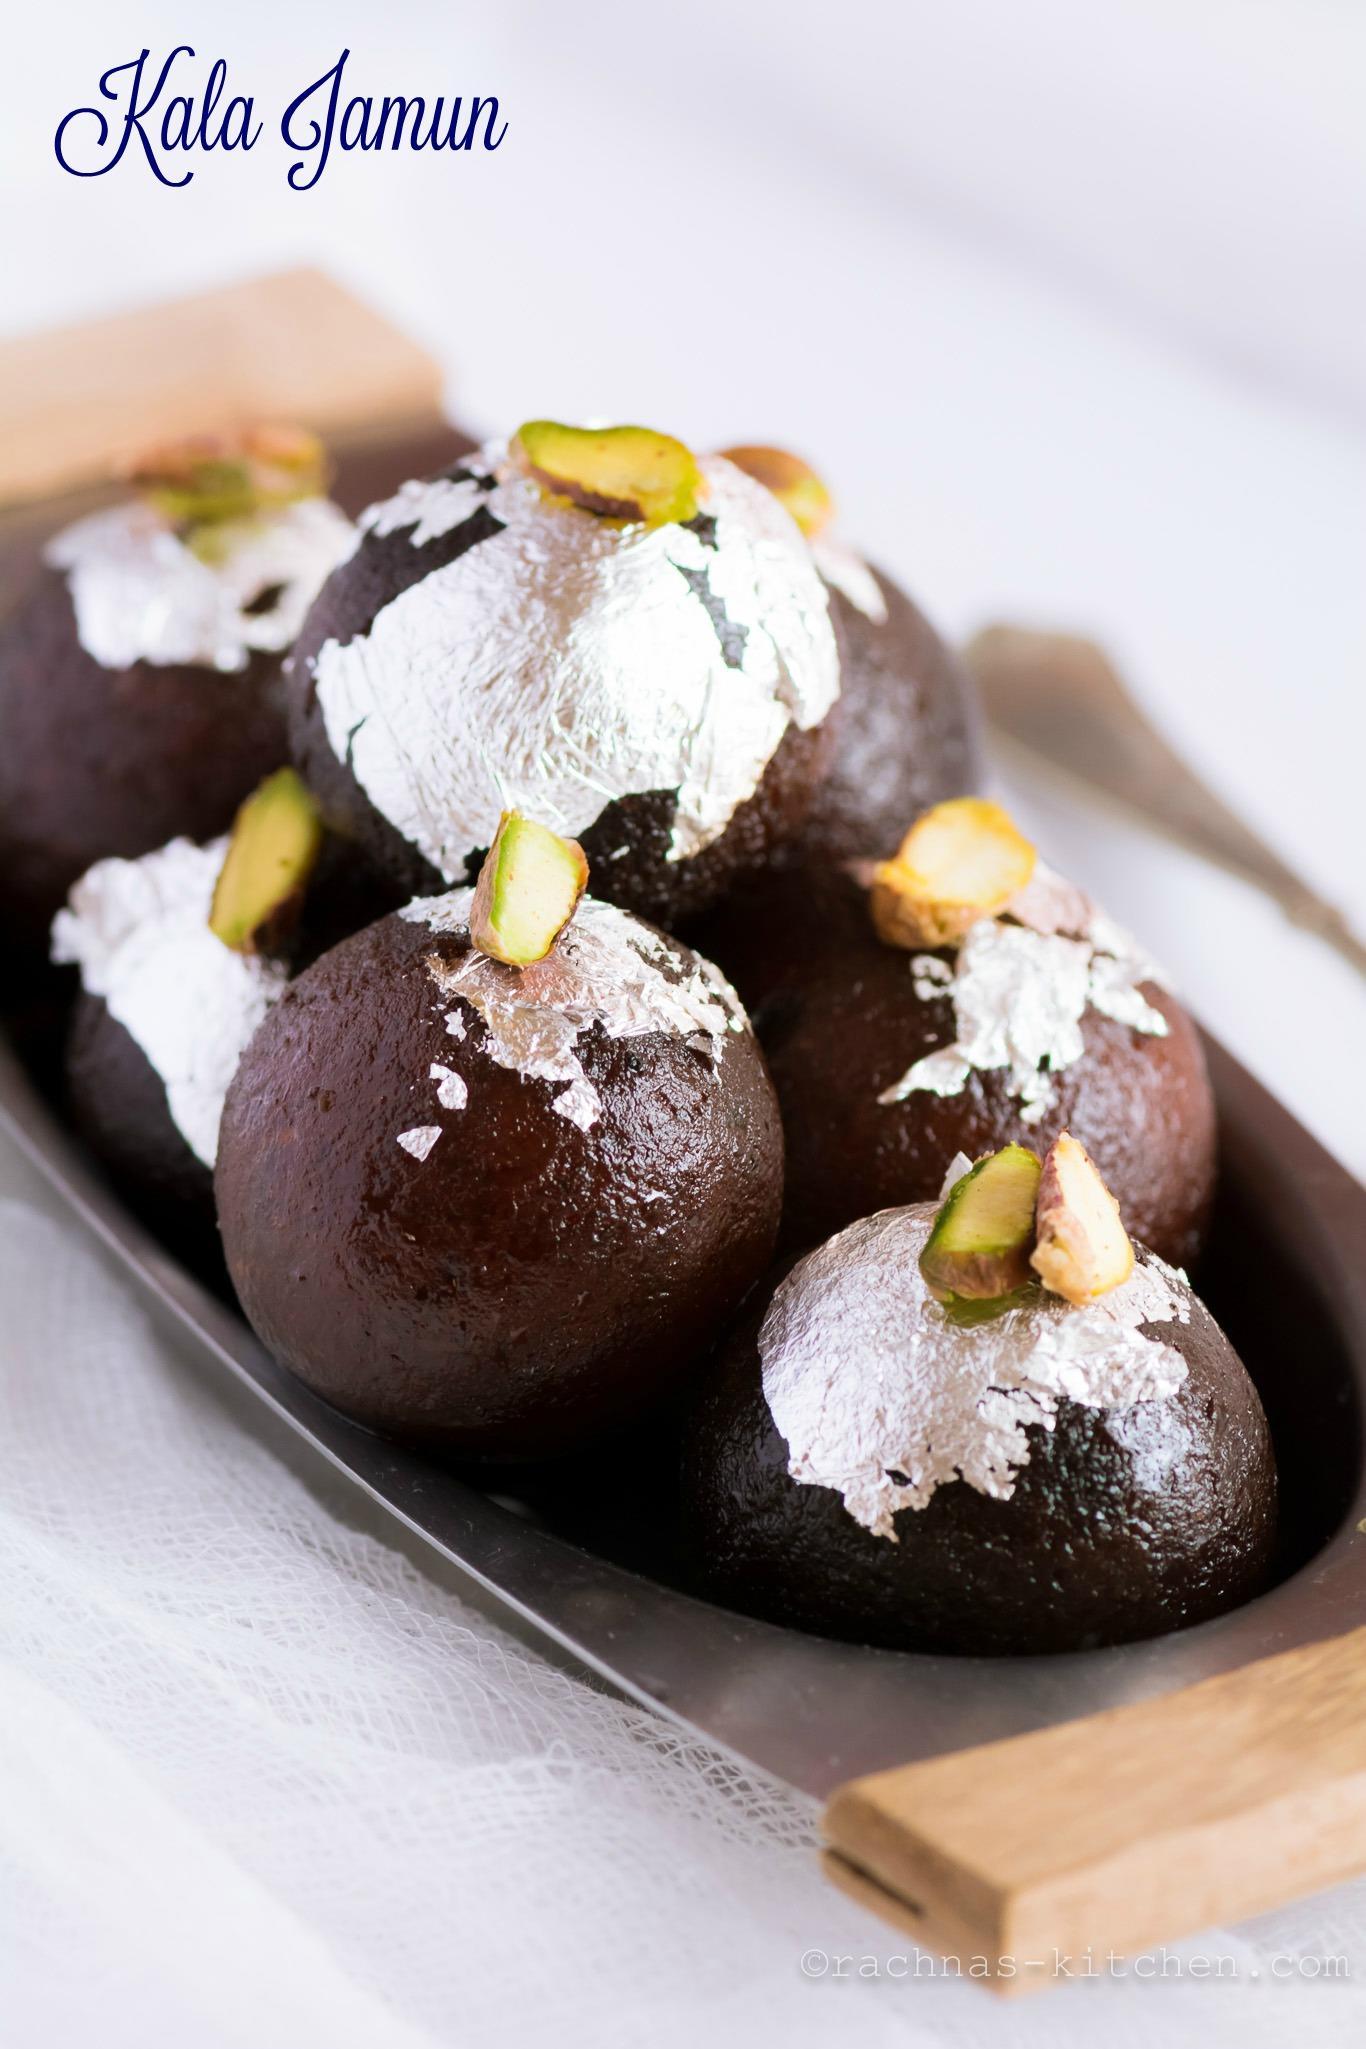 kala Jamun Recipe | Kala jamun recipe with khoya